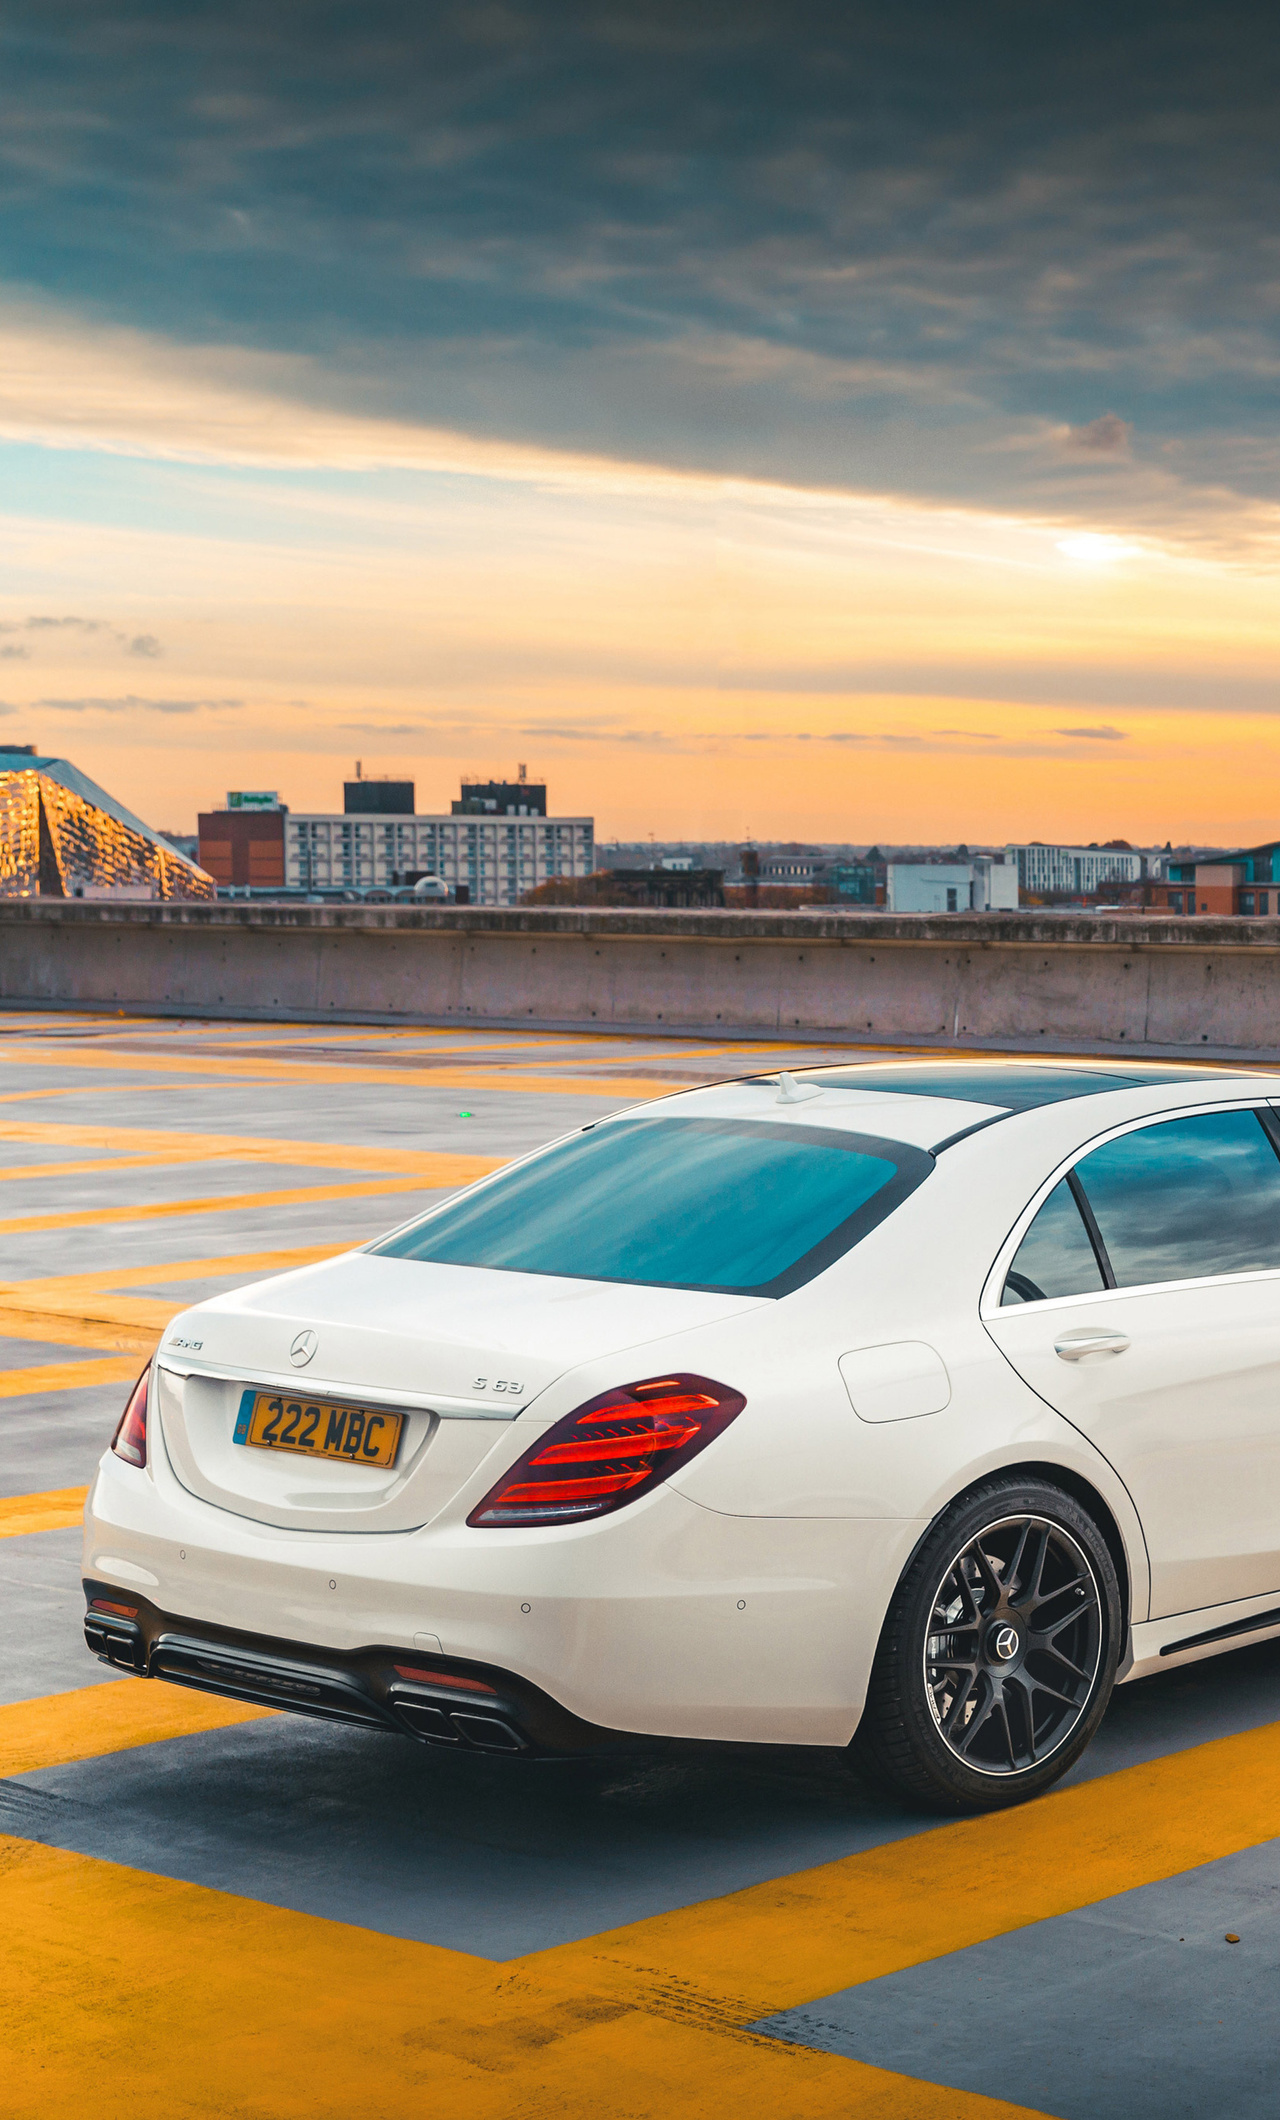 1280x2120 2018 Mercedes AMG S63 Back View iPhone 6+ HD 4k ...